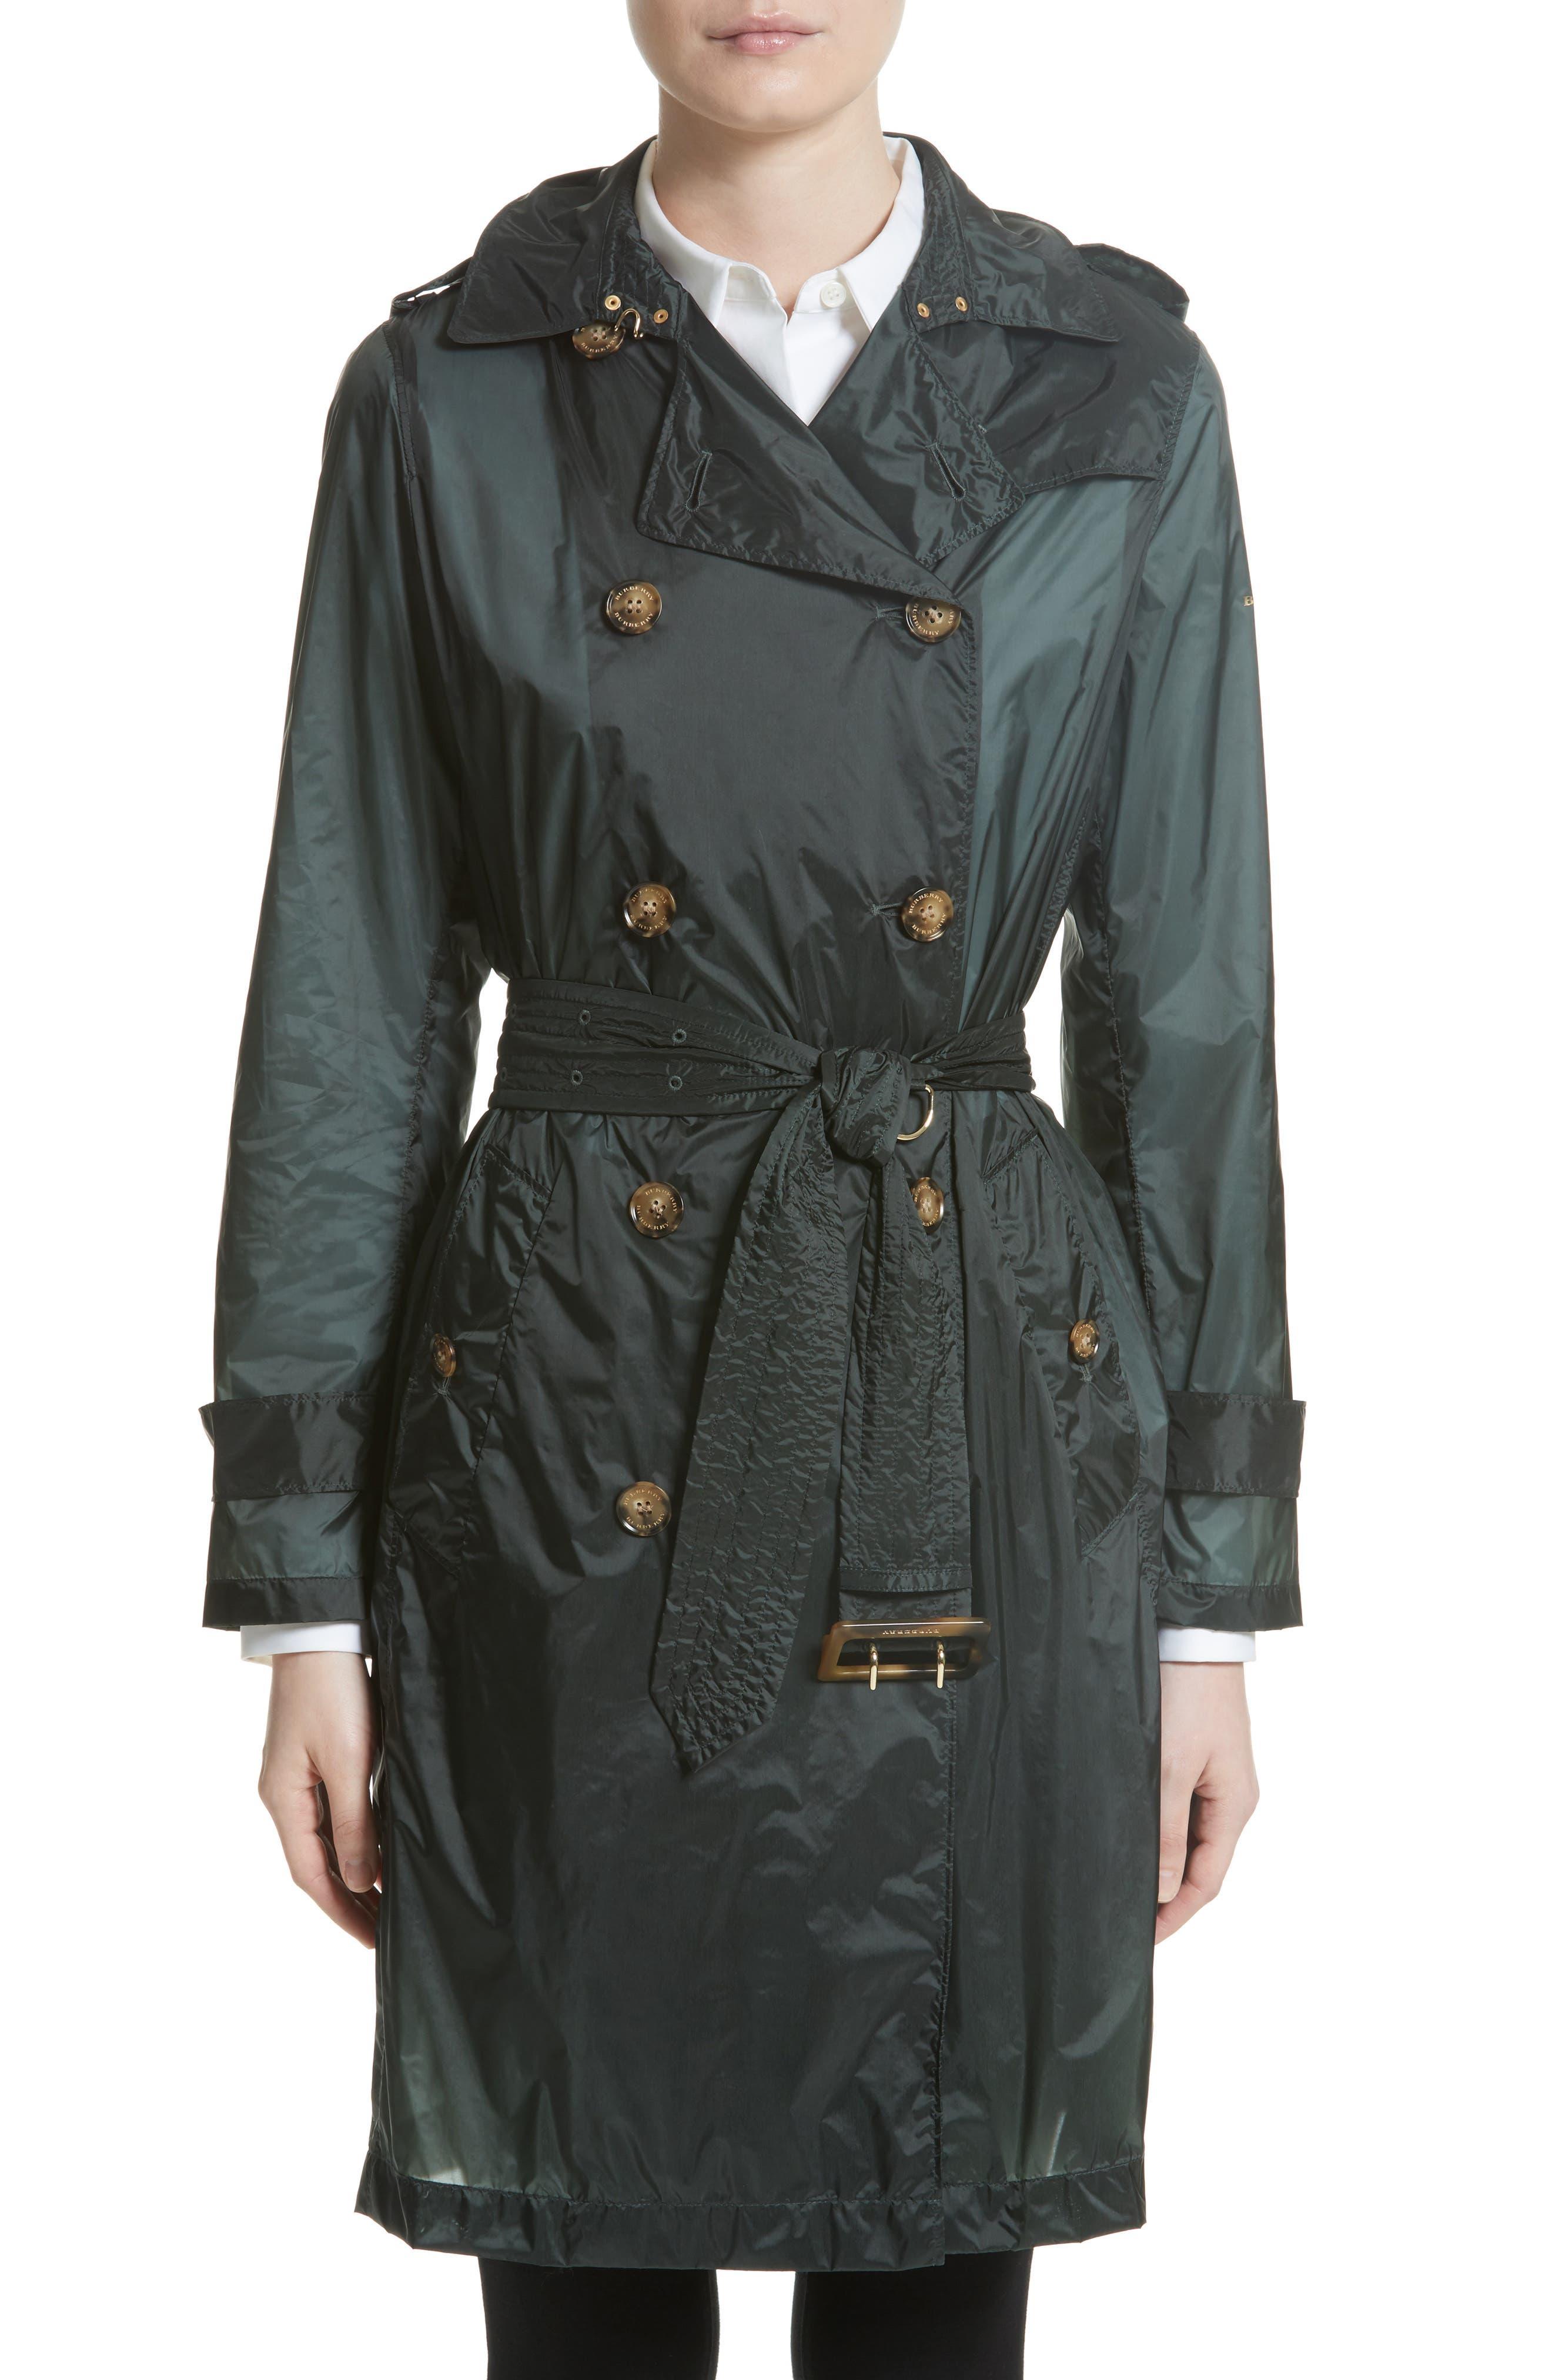 Burberry Kenwick Trench Coat